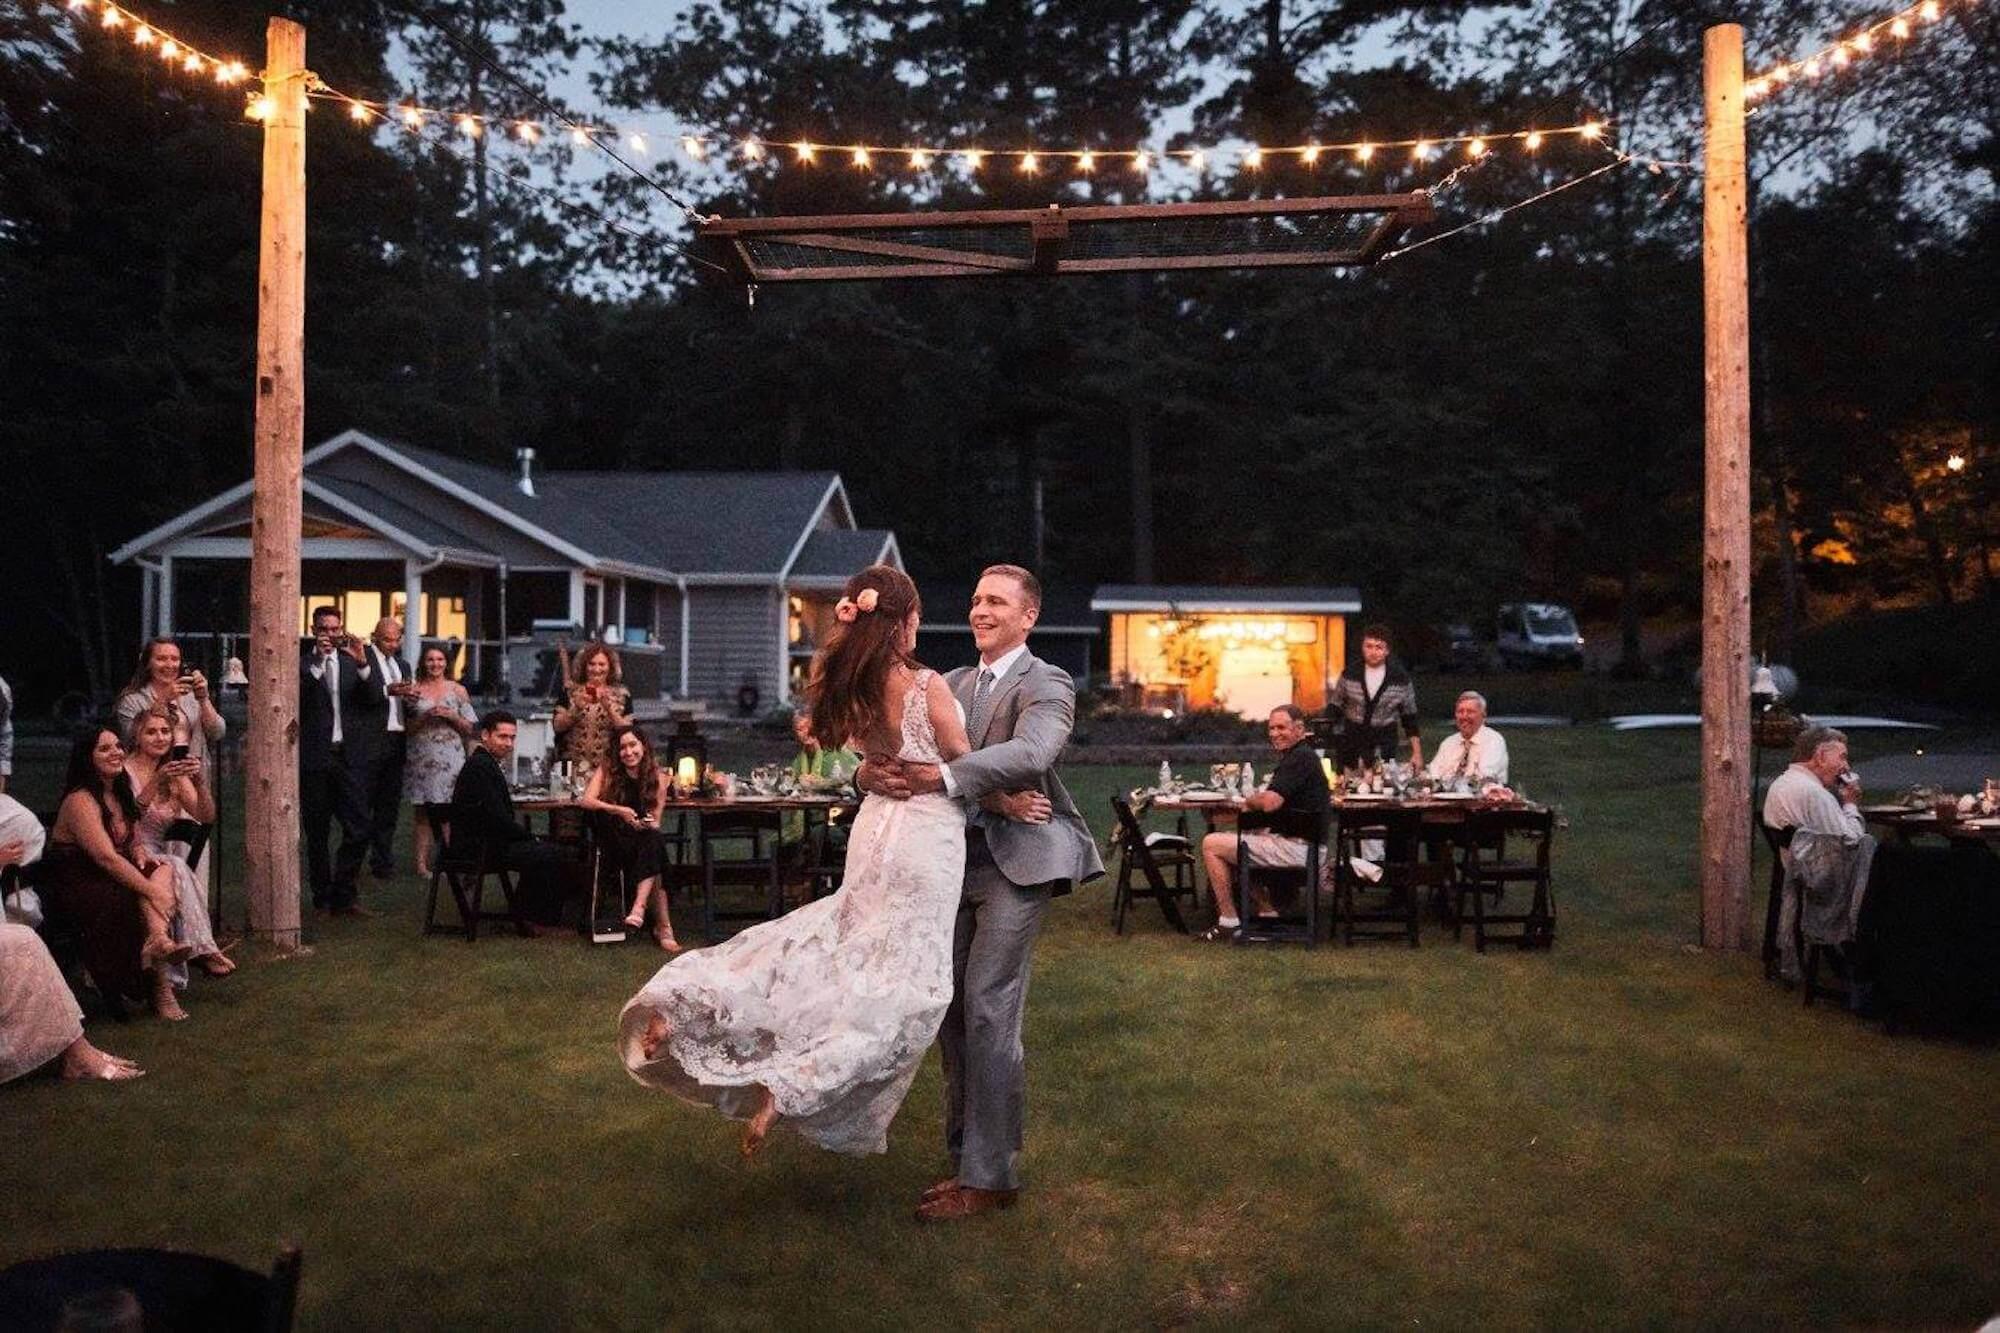 engle-olson-wedding-video-perry-james-photography-45.jpg